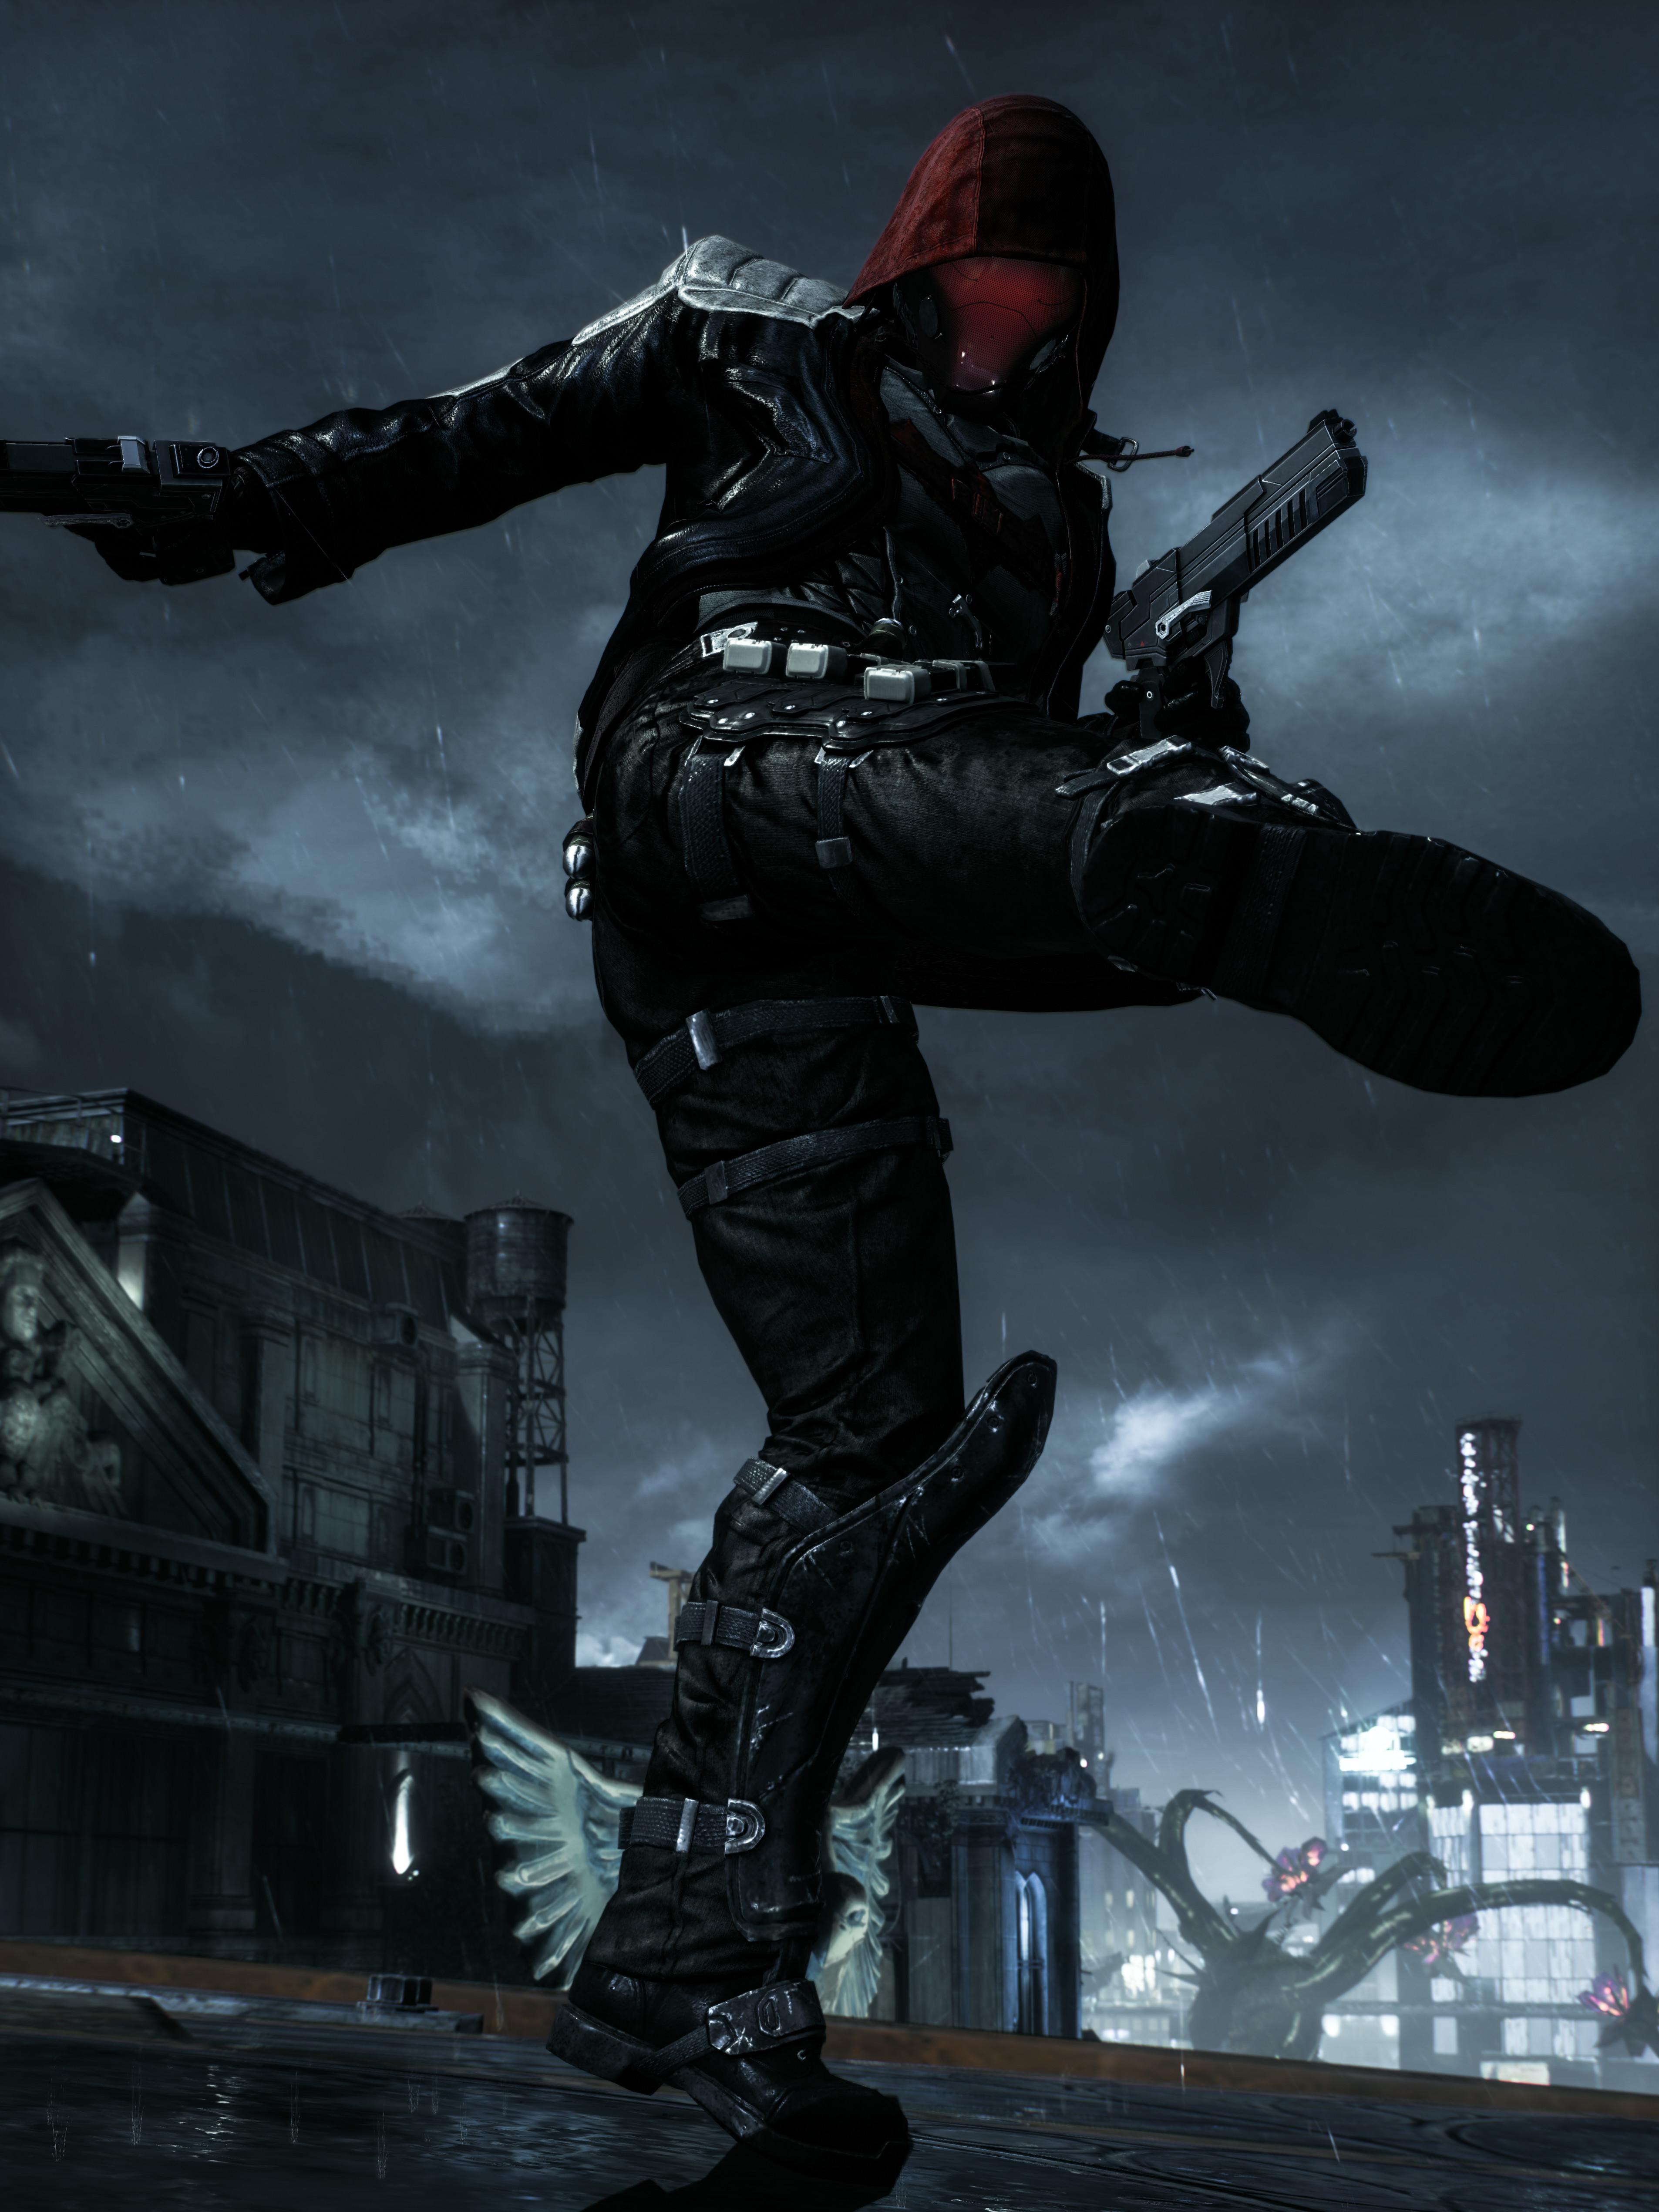 42175542905_1e6b06cf4c_5k.jpg - Batman: Arkham Knight